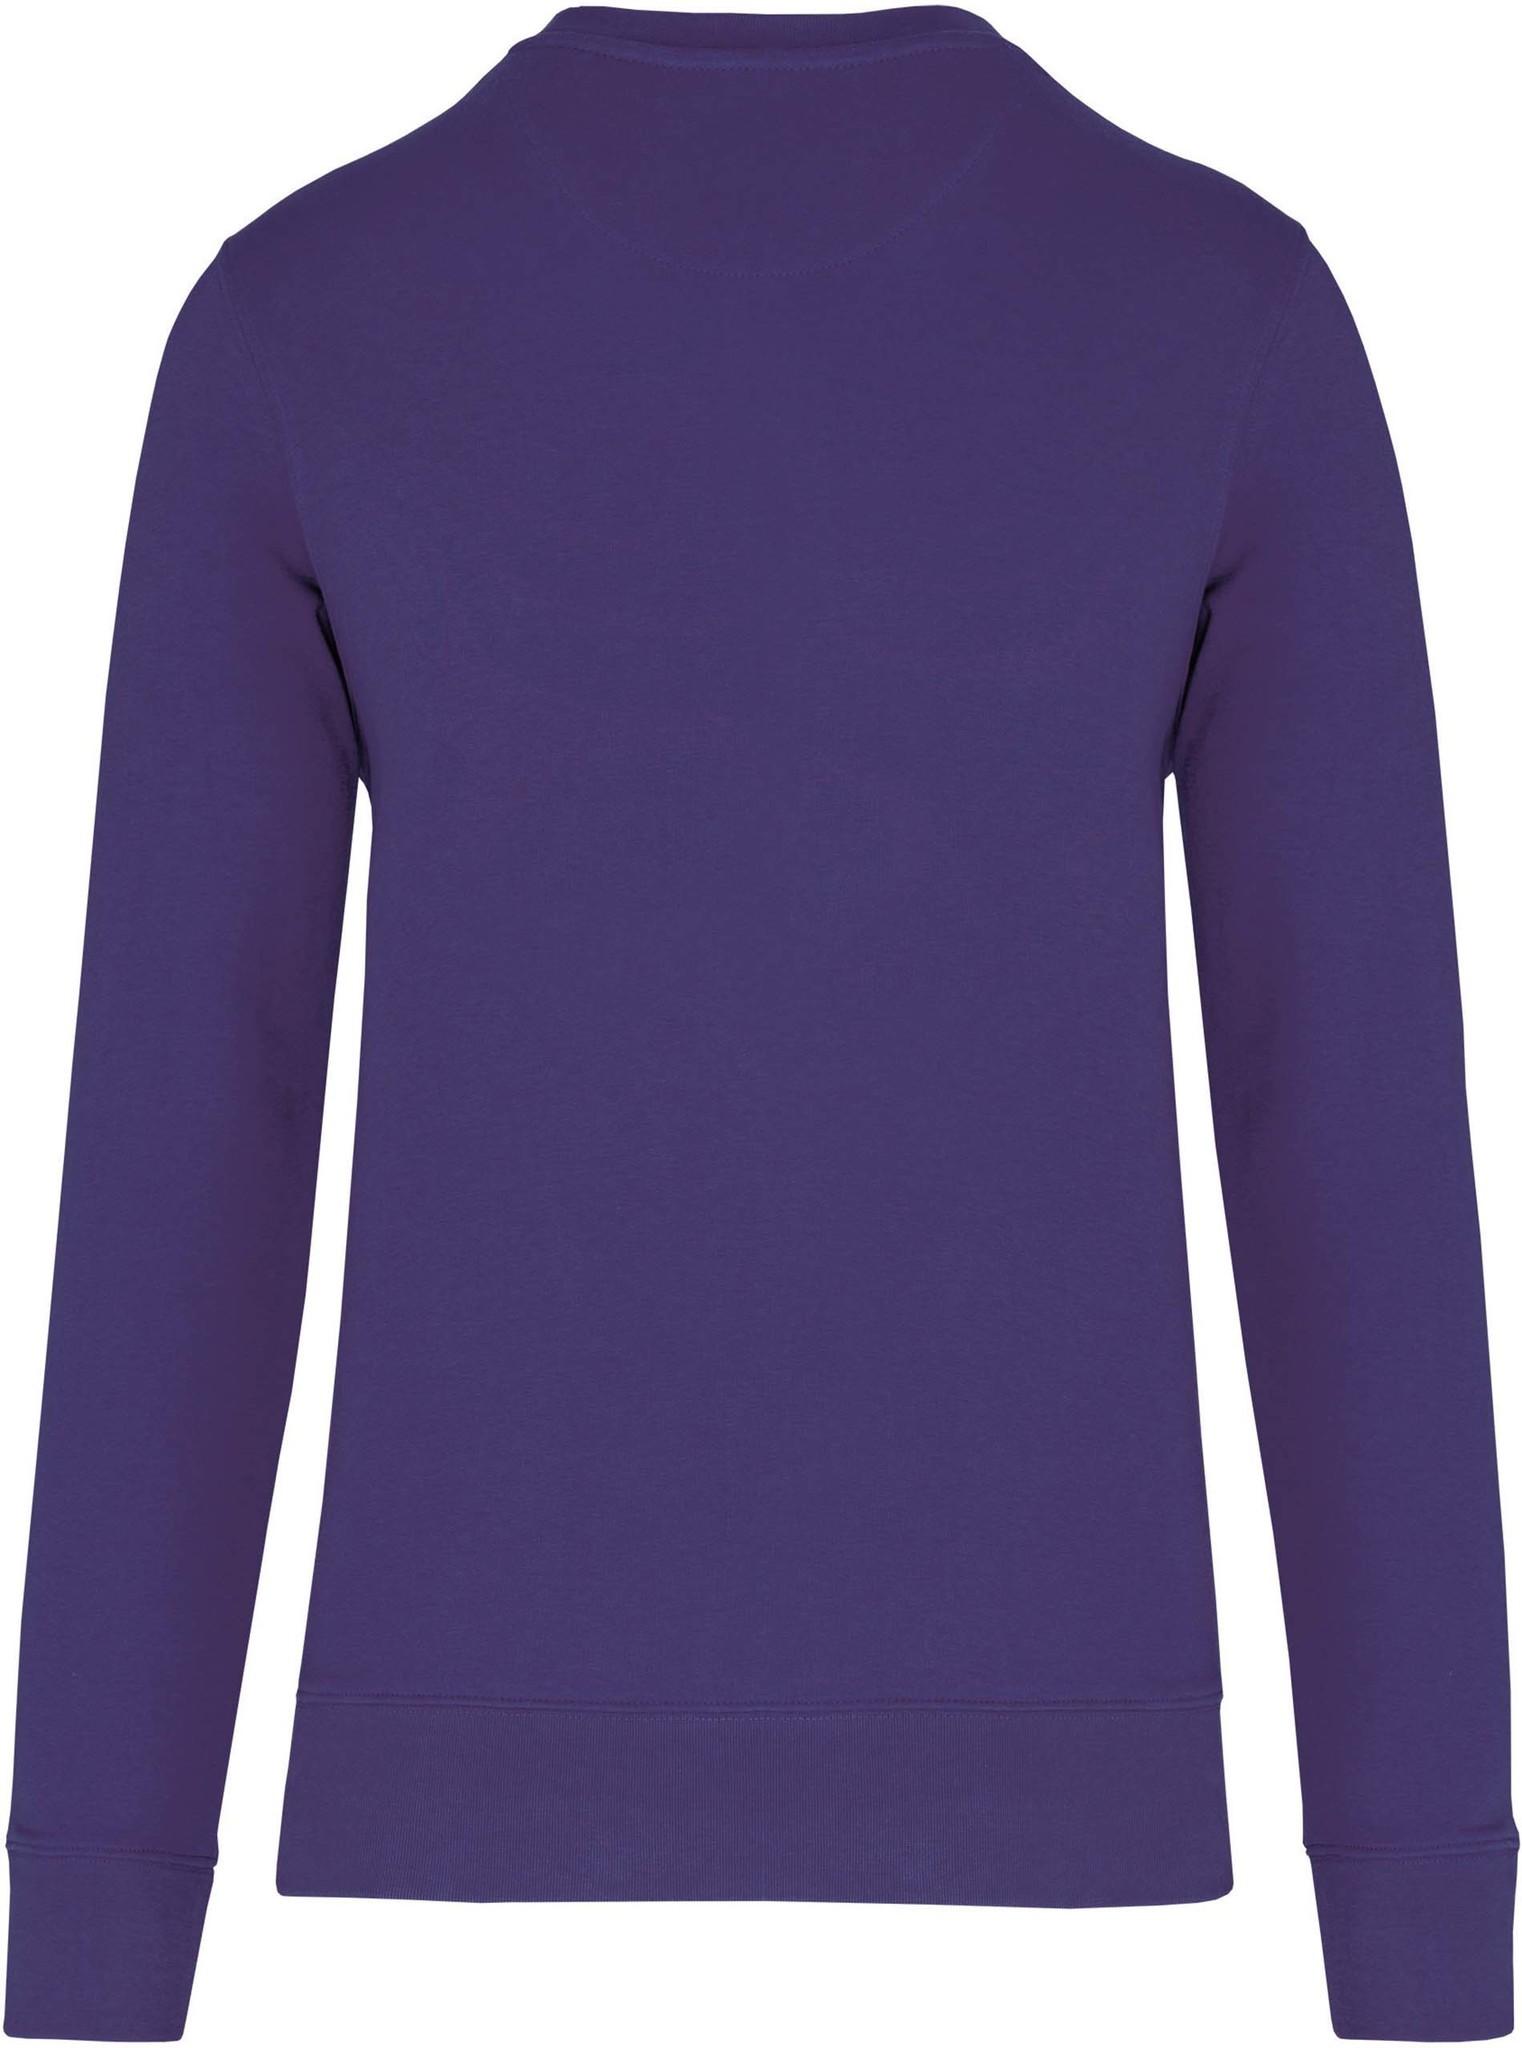 Eco-Friendly Sweater UNI Deep Purple